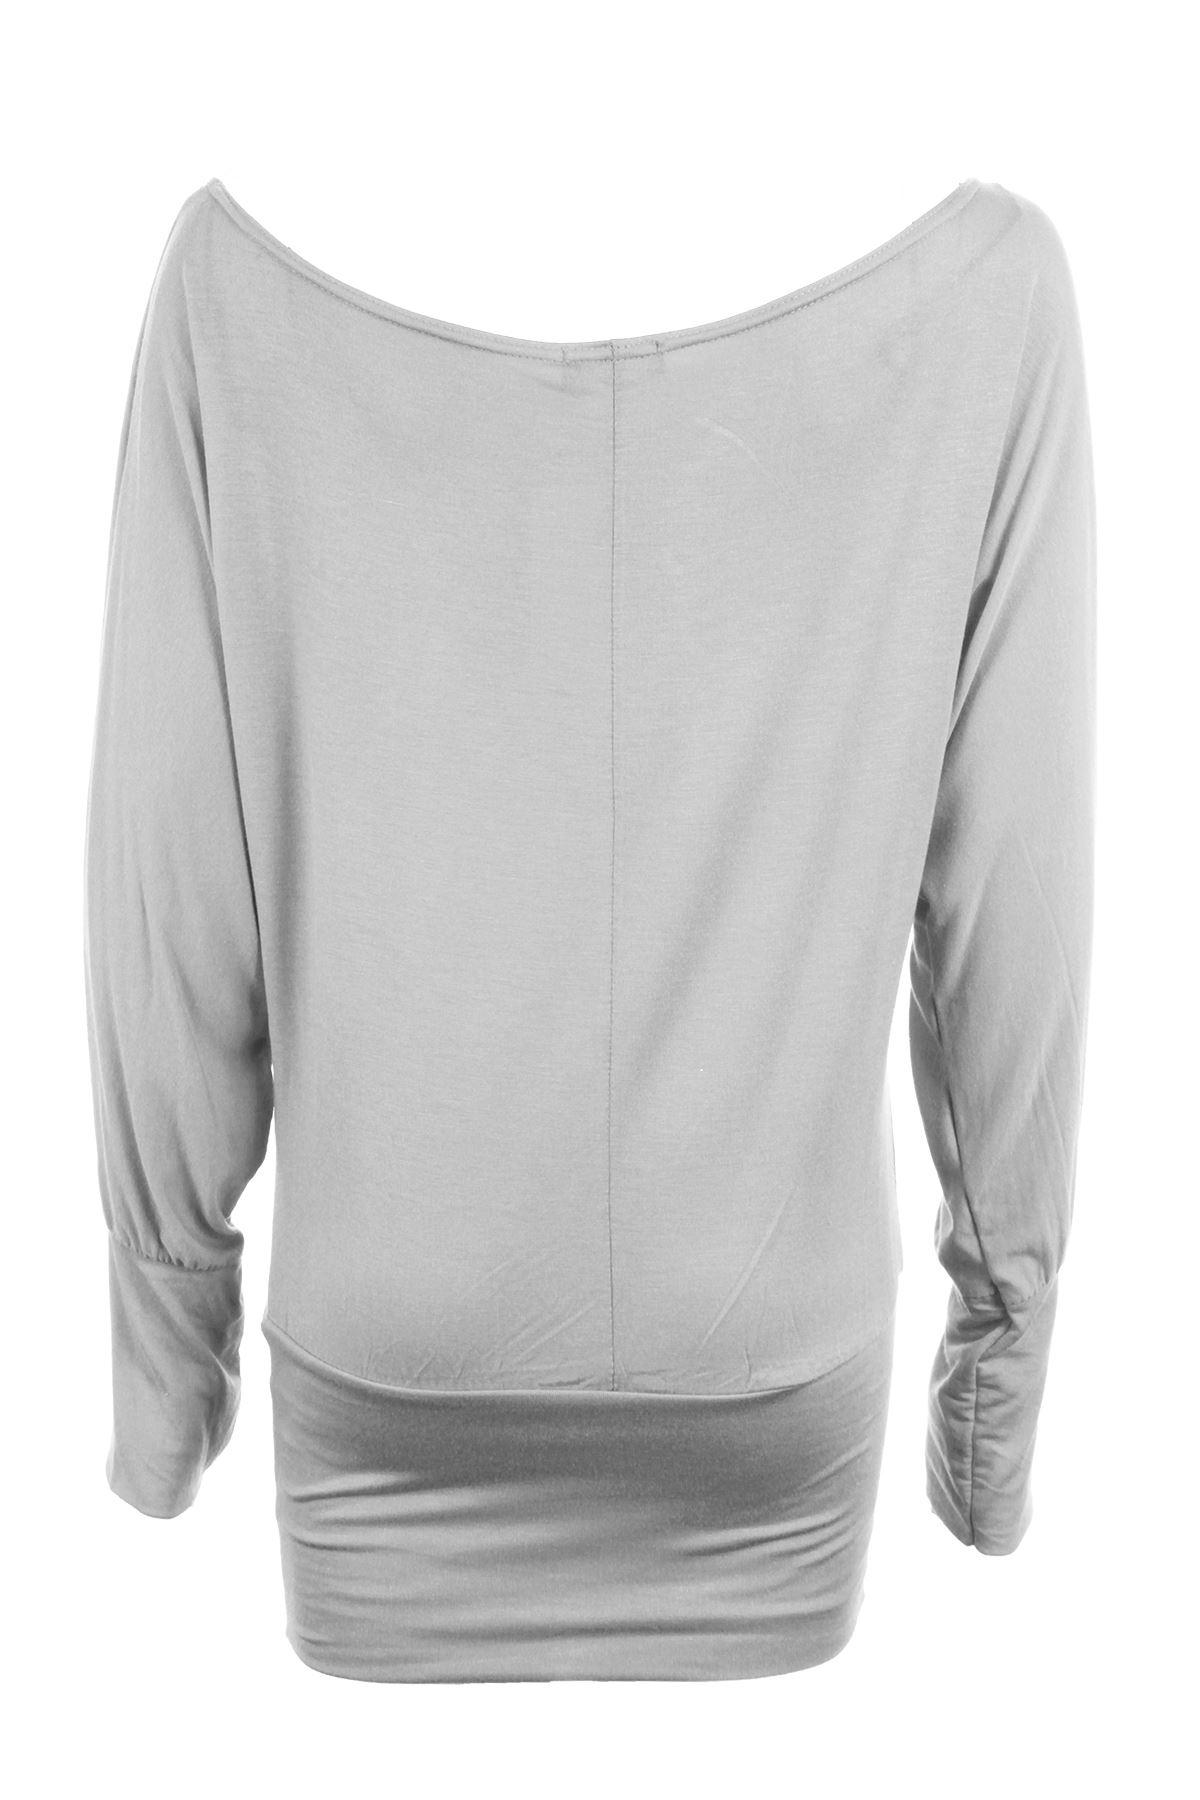 Women/'s Off Shoulder Long Sleeve Plain Ladies Batwing Baggy Top Sizes UK 8-22